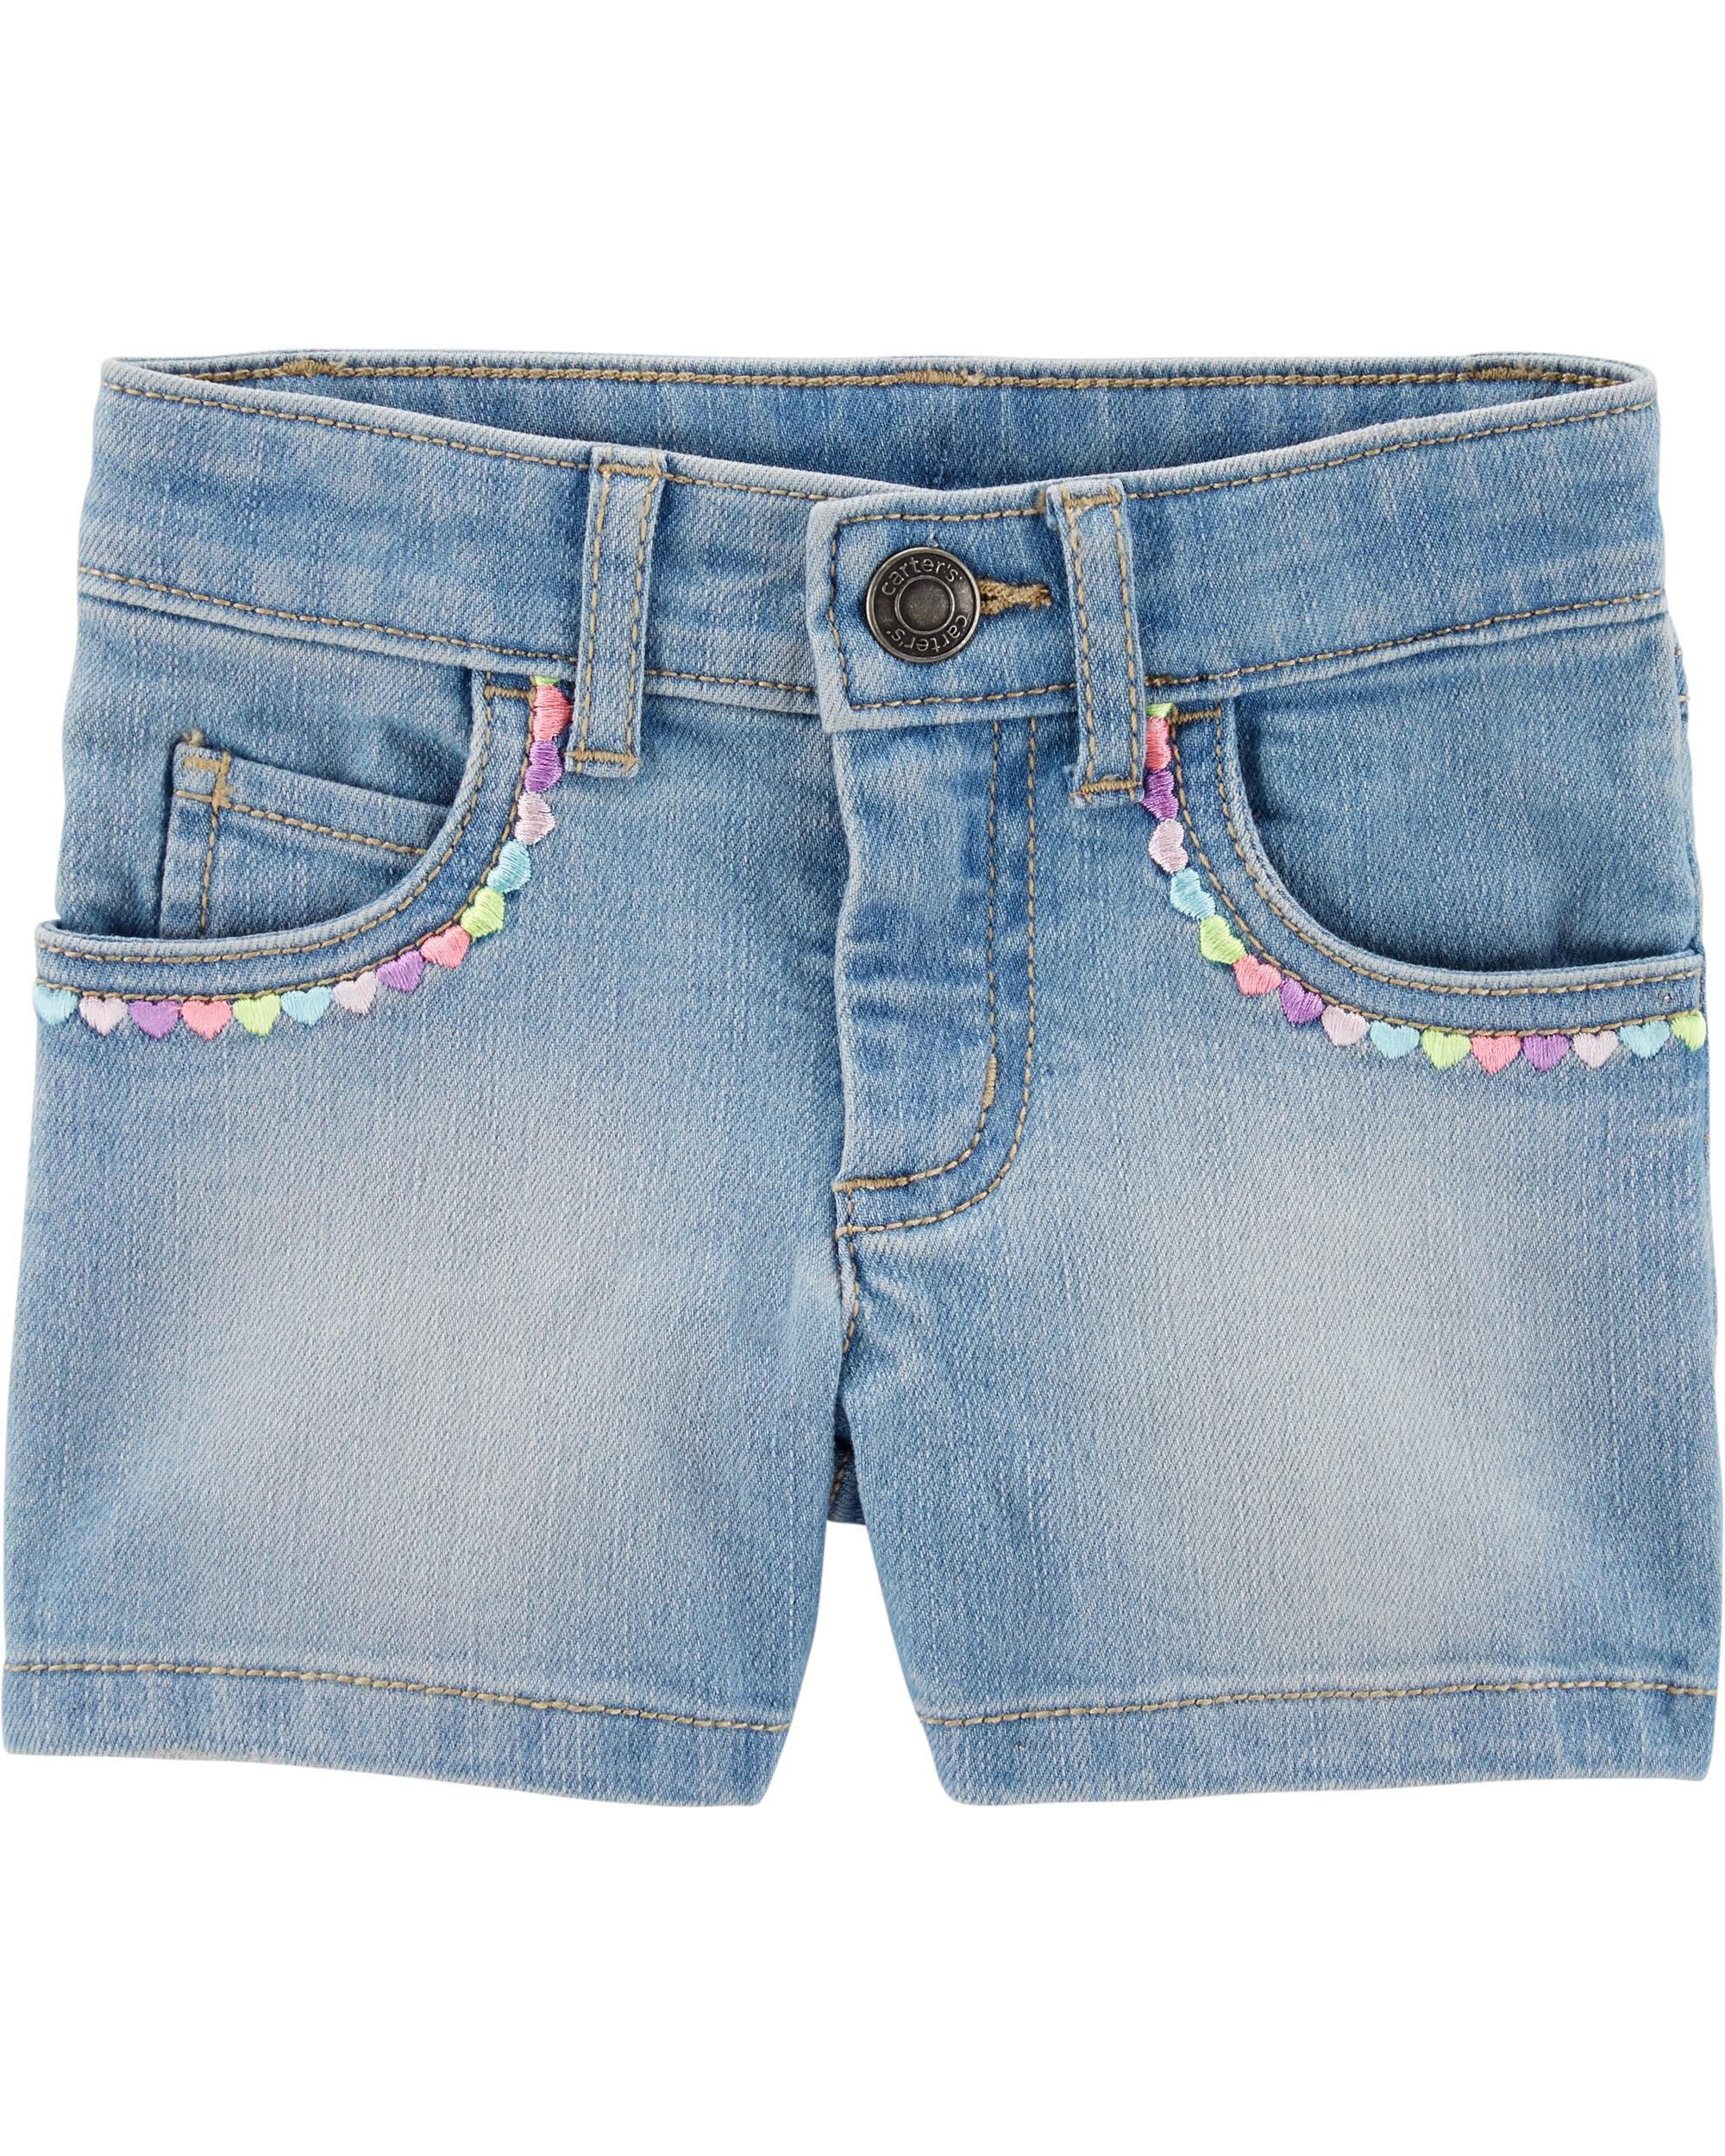 *Clearance*  Sequin 5-Pocket Denim Shorts